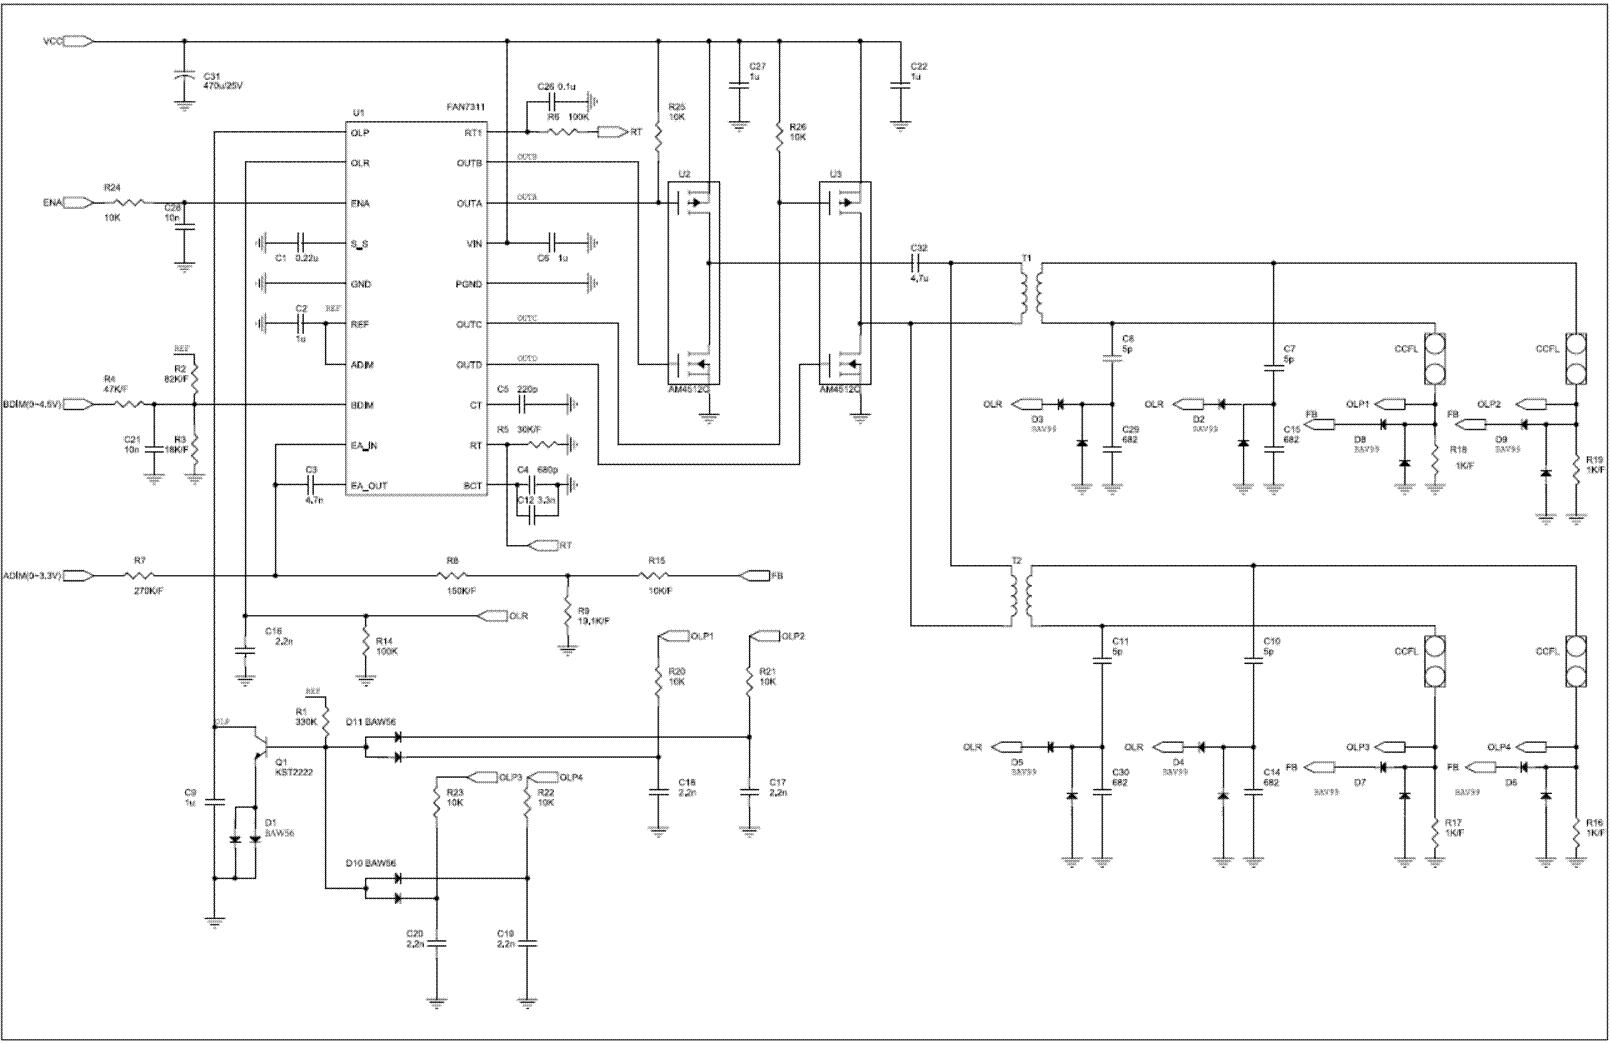 bn44-00121j схема